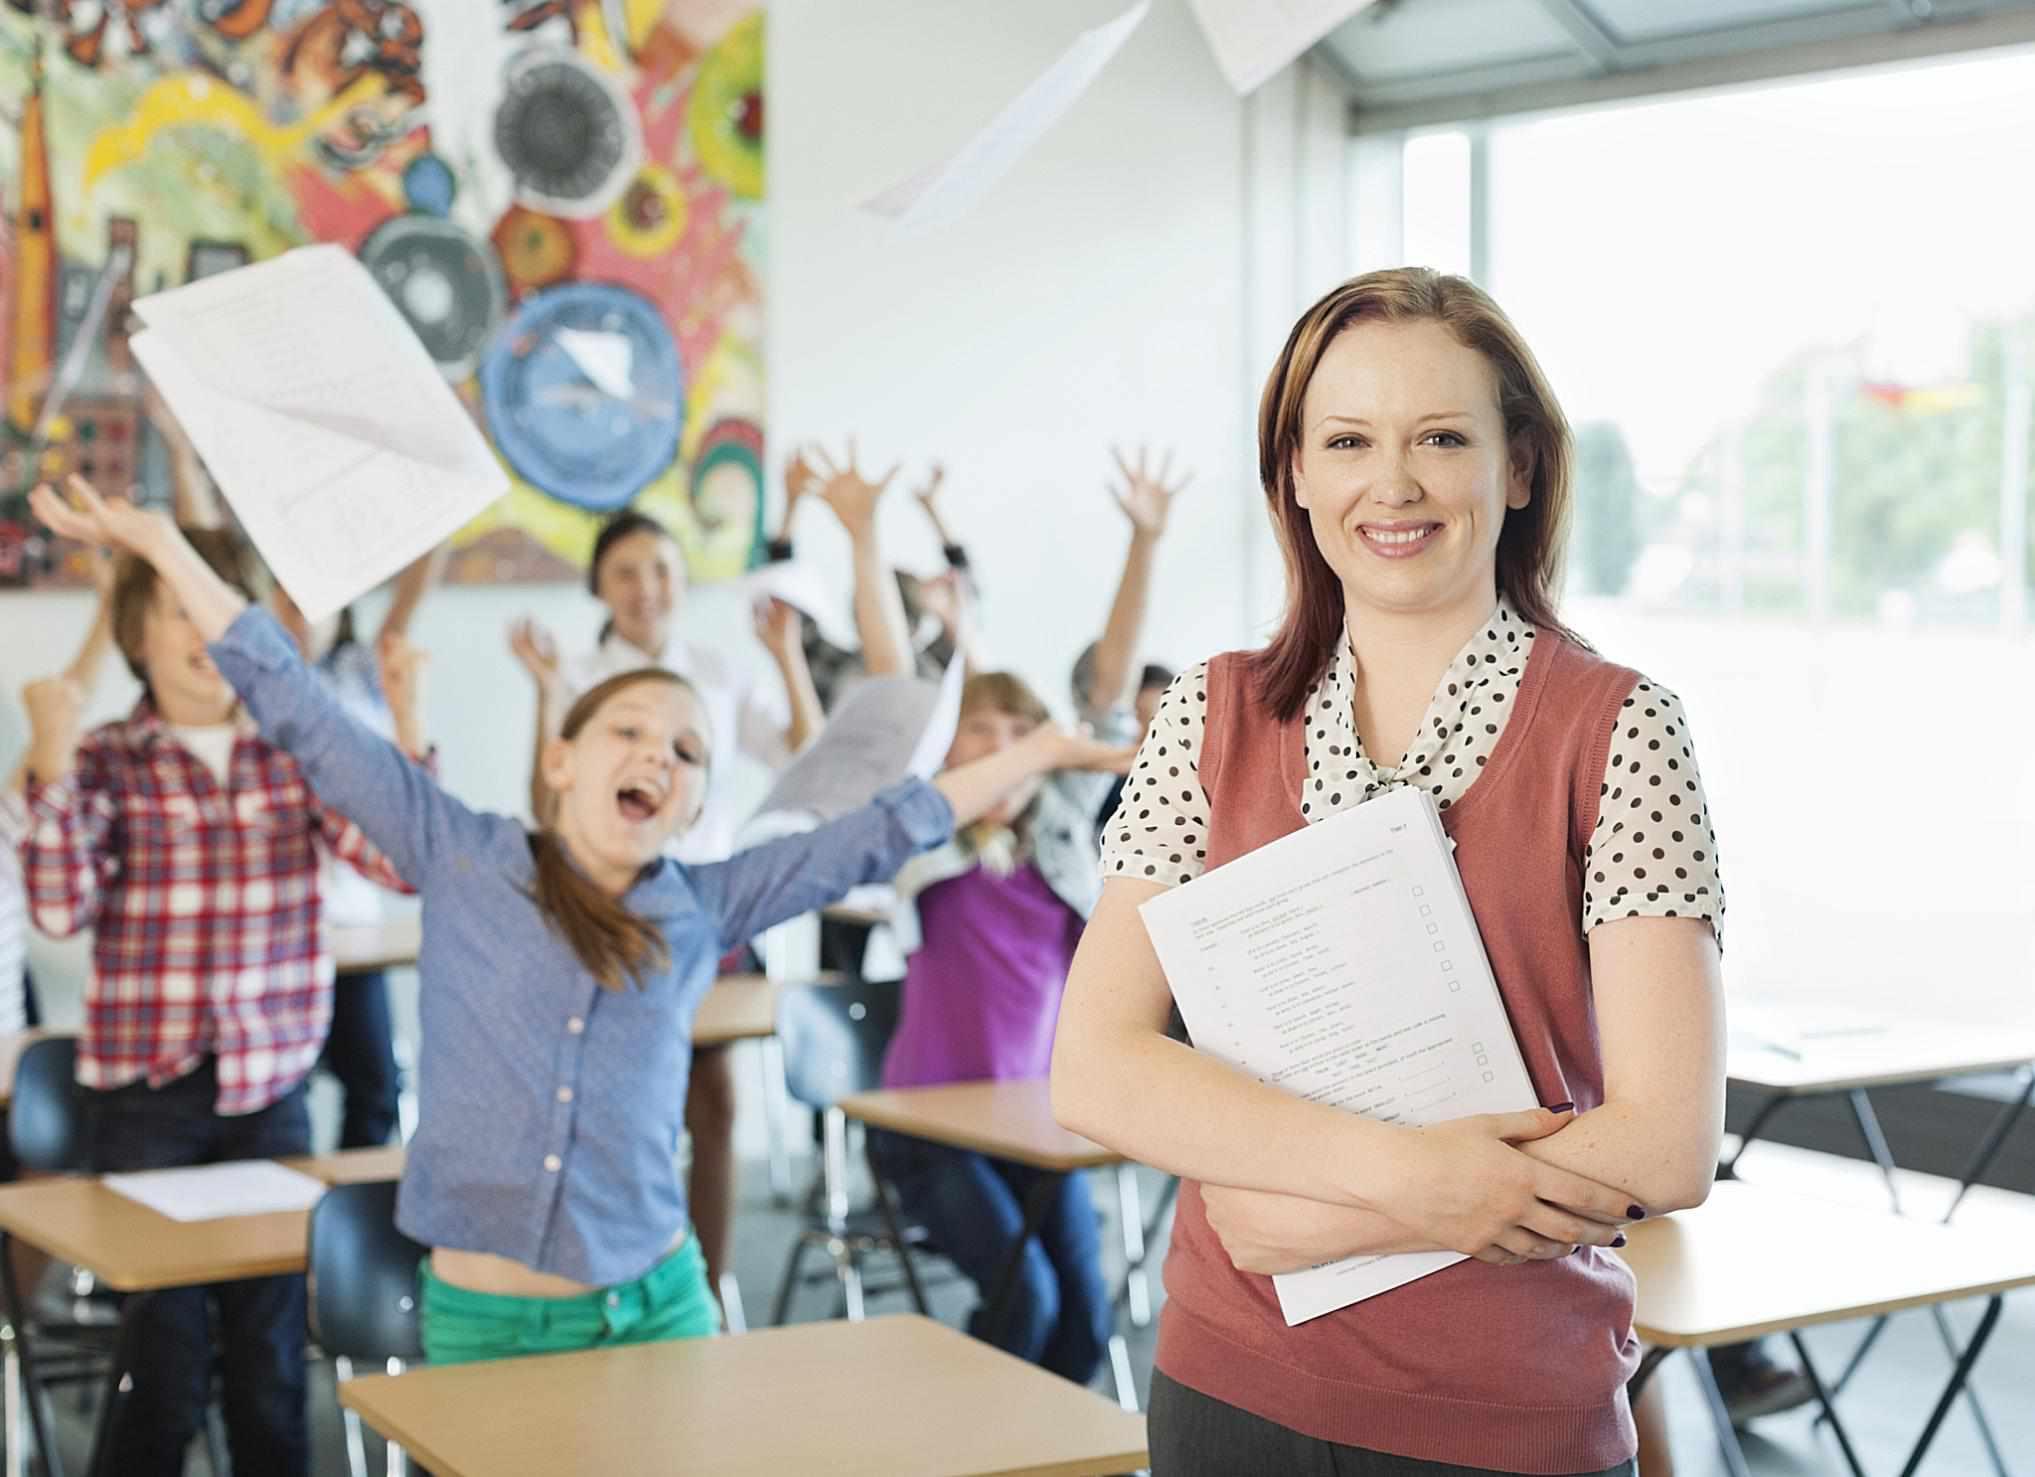 A teacher in front of screaming children